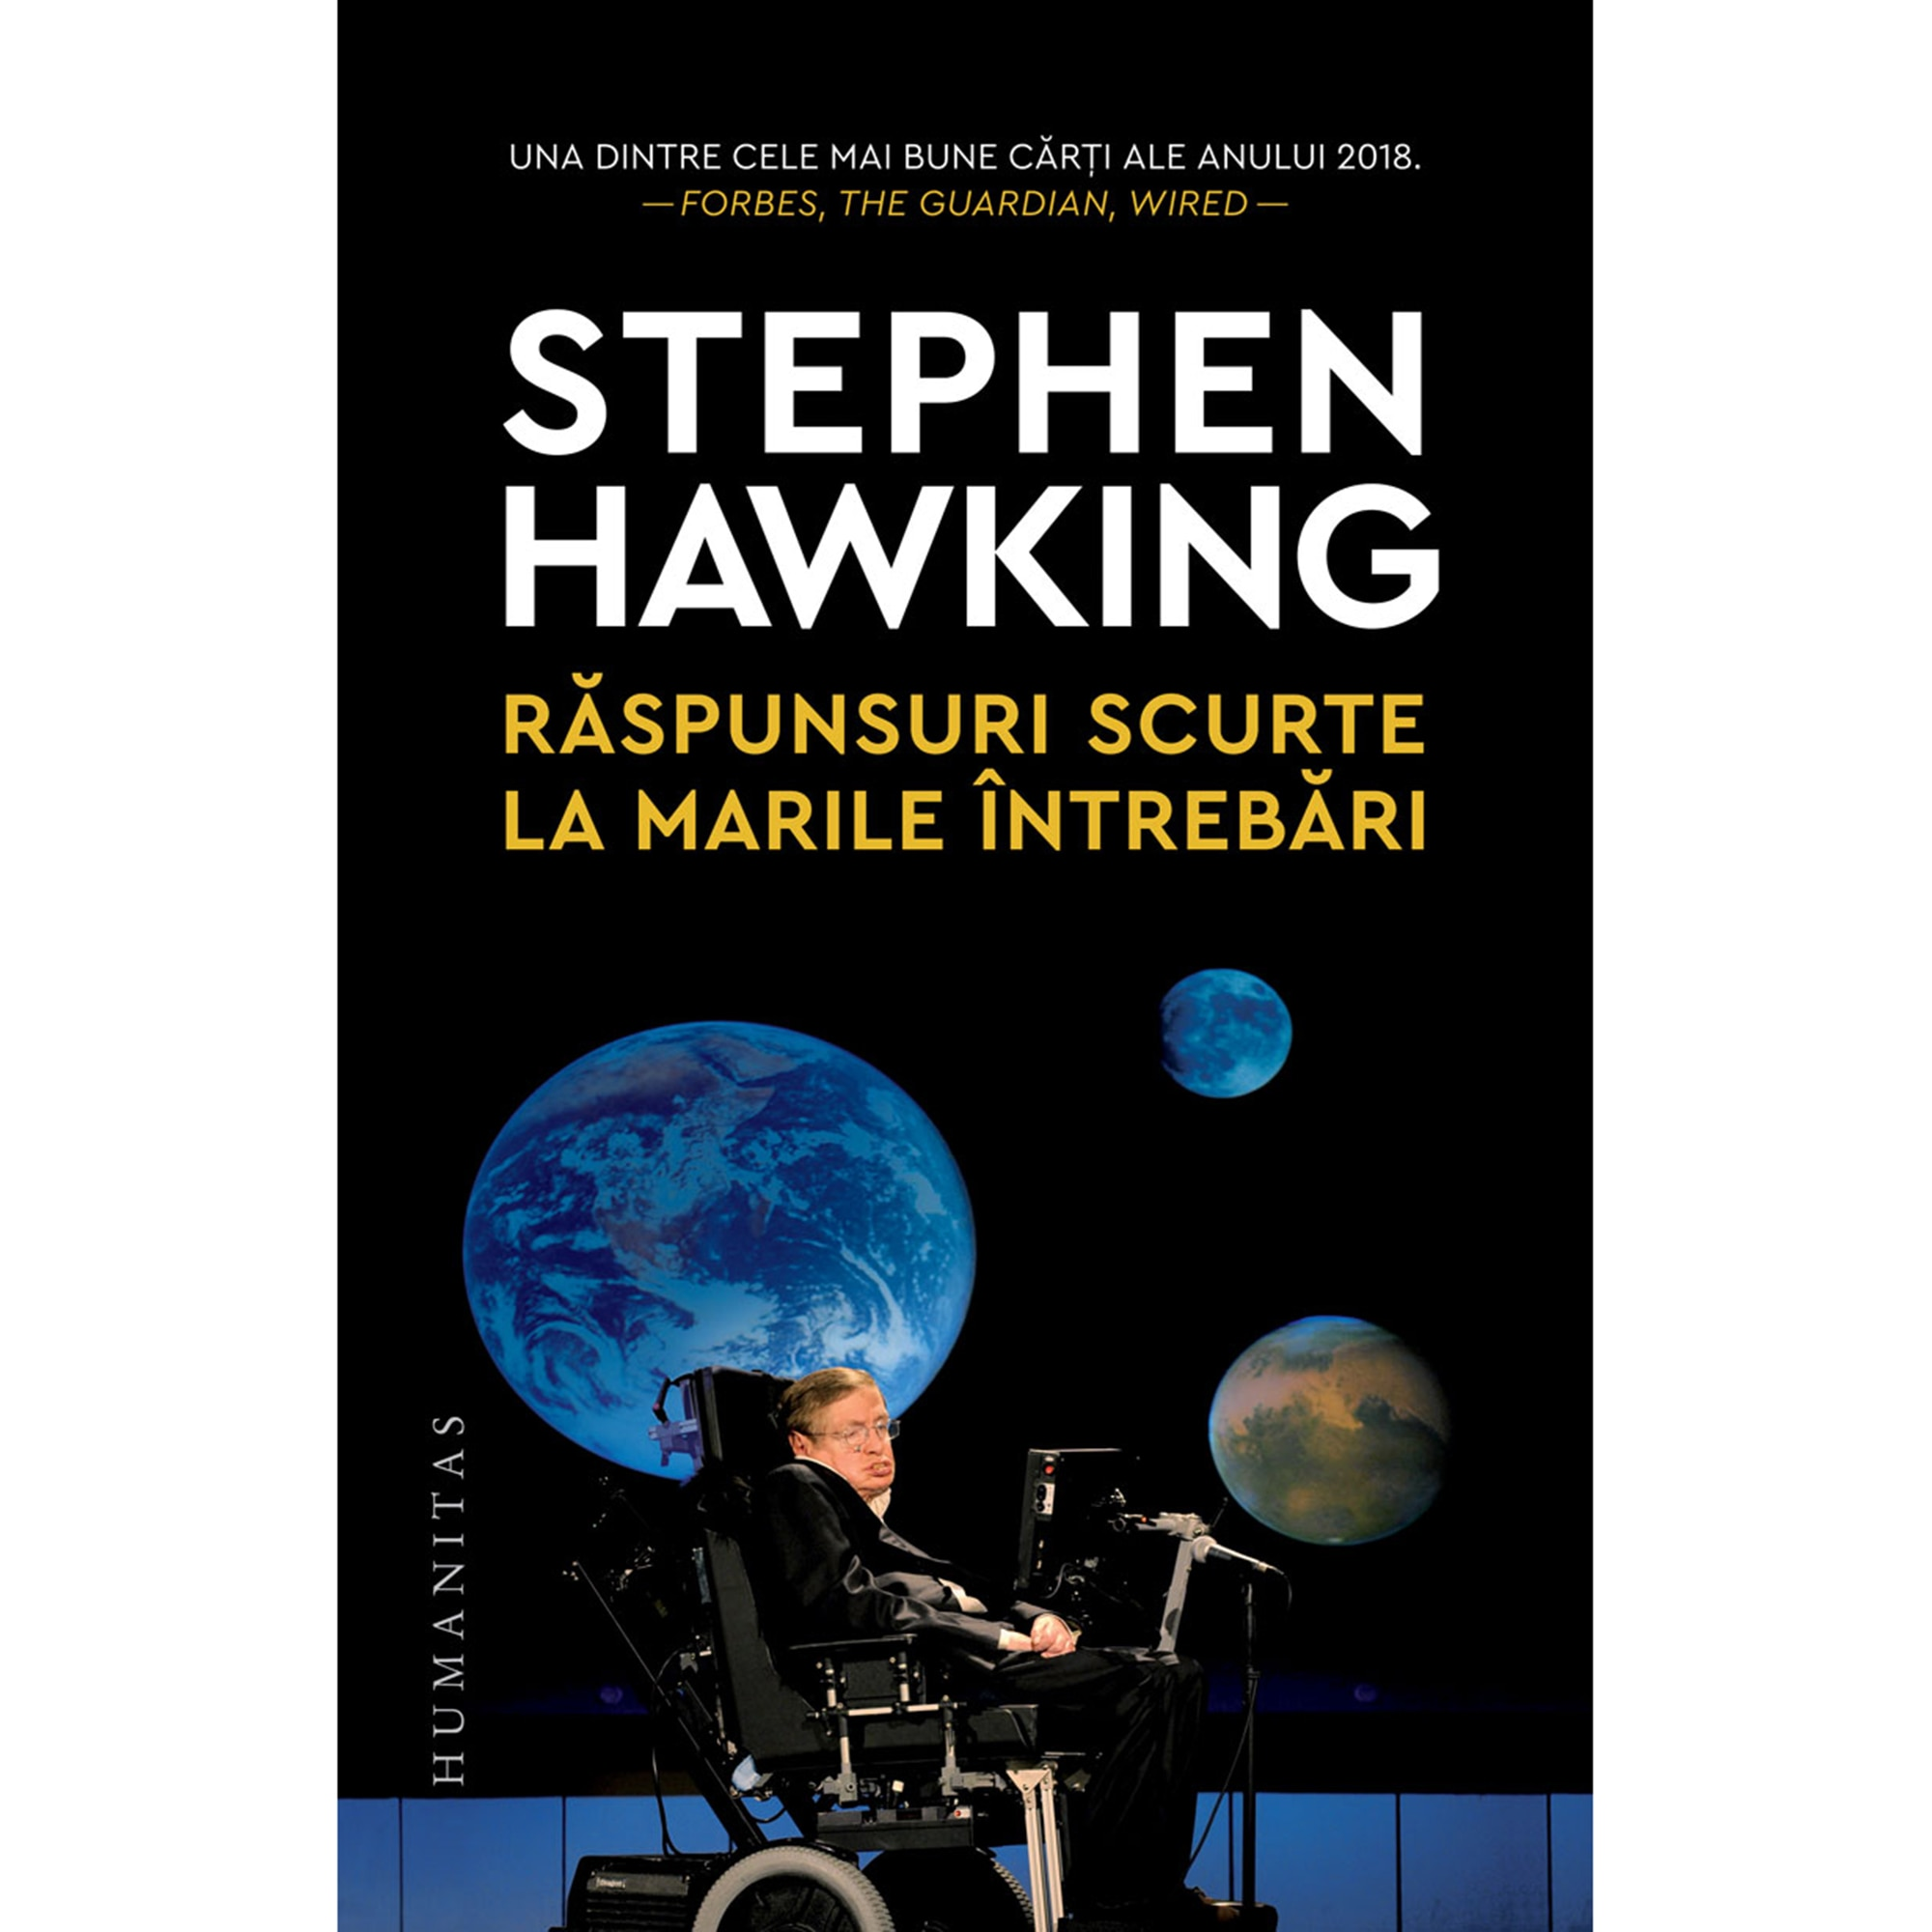 Raspunsuri scurte la marile intrebari, Stephen Hawking - eMAG.ro